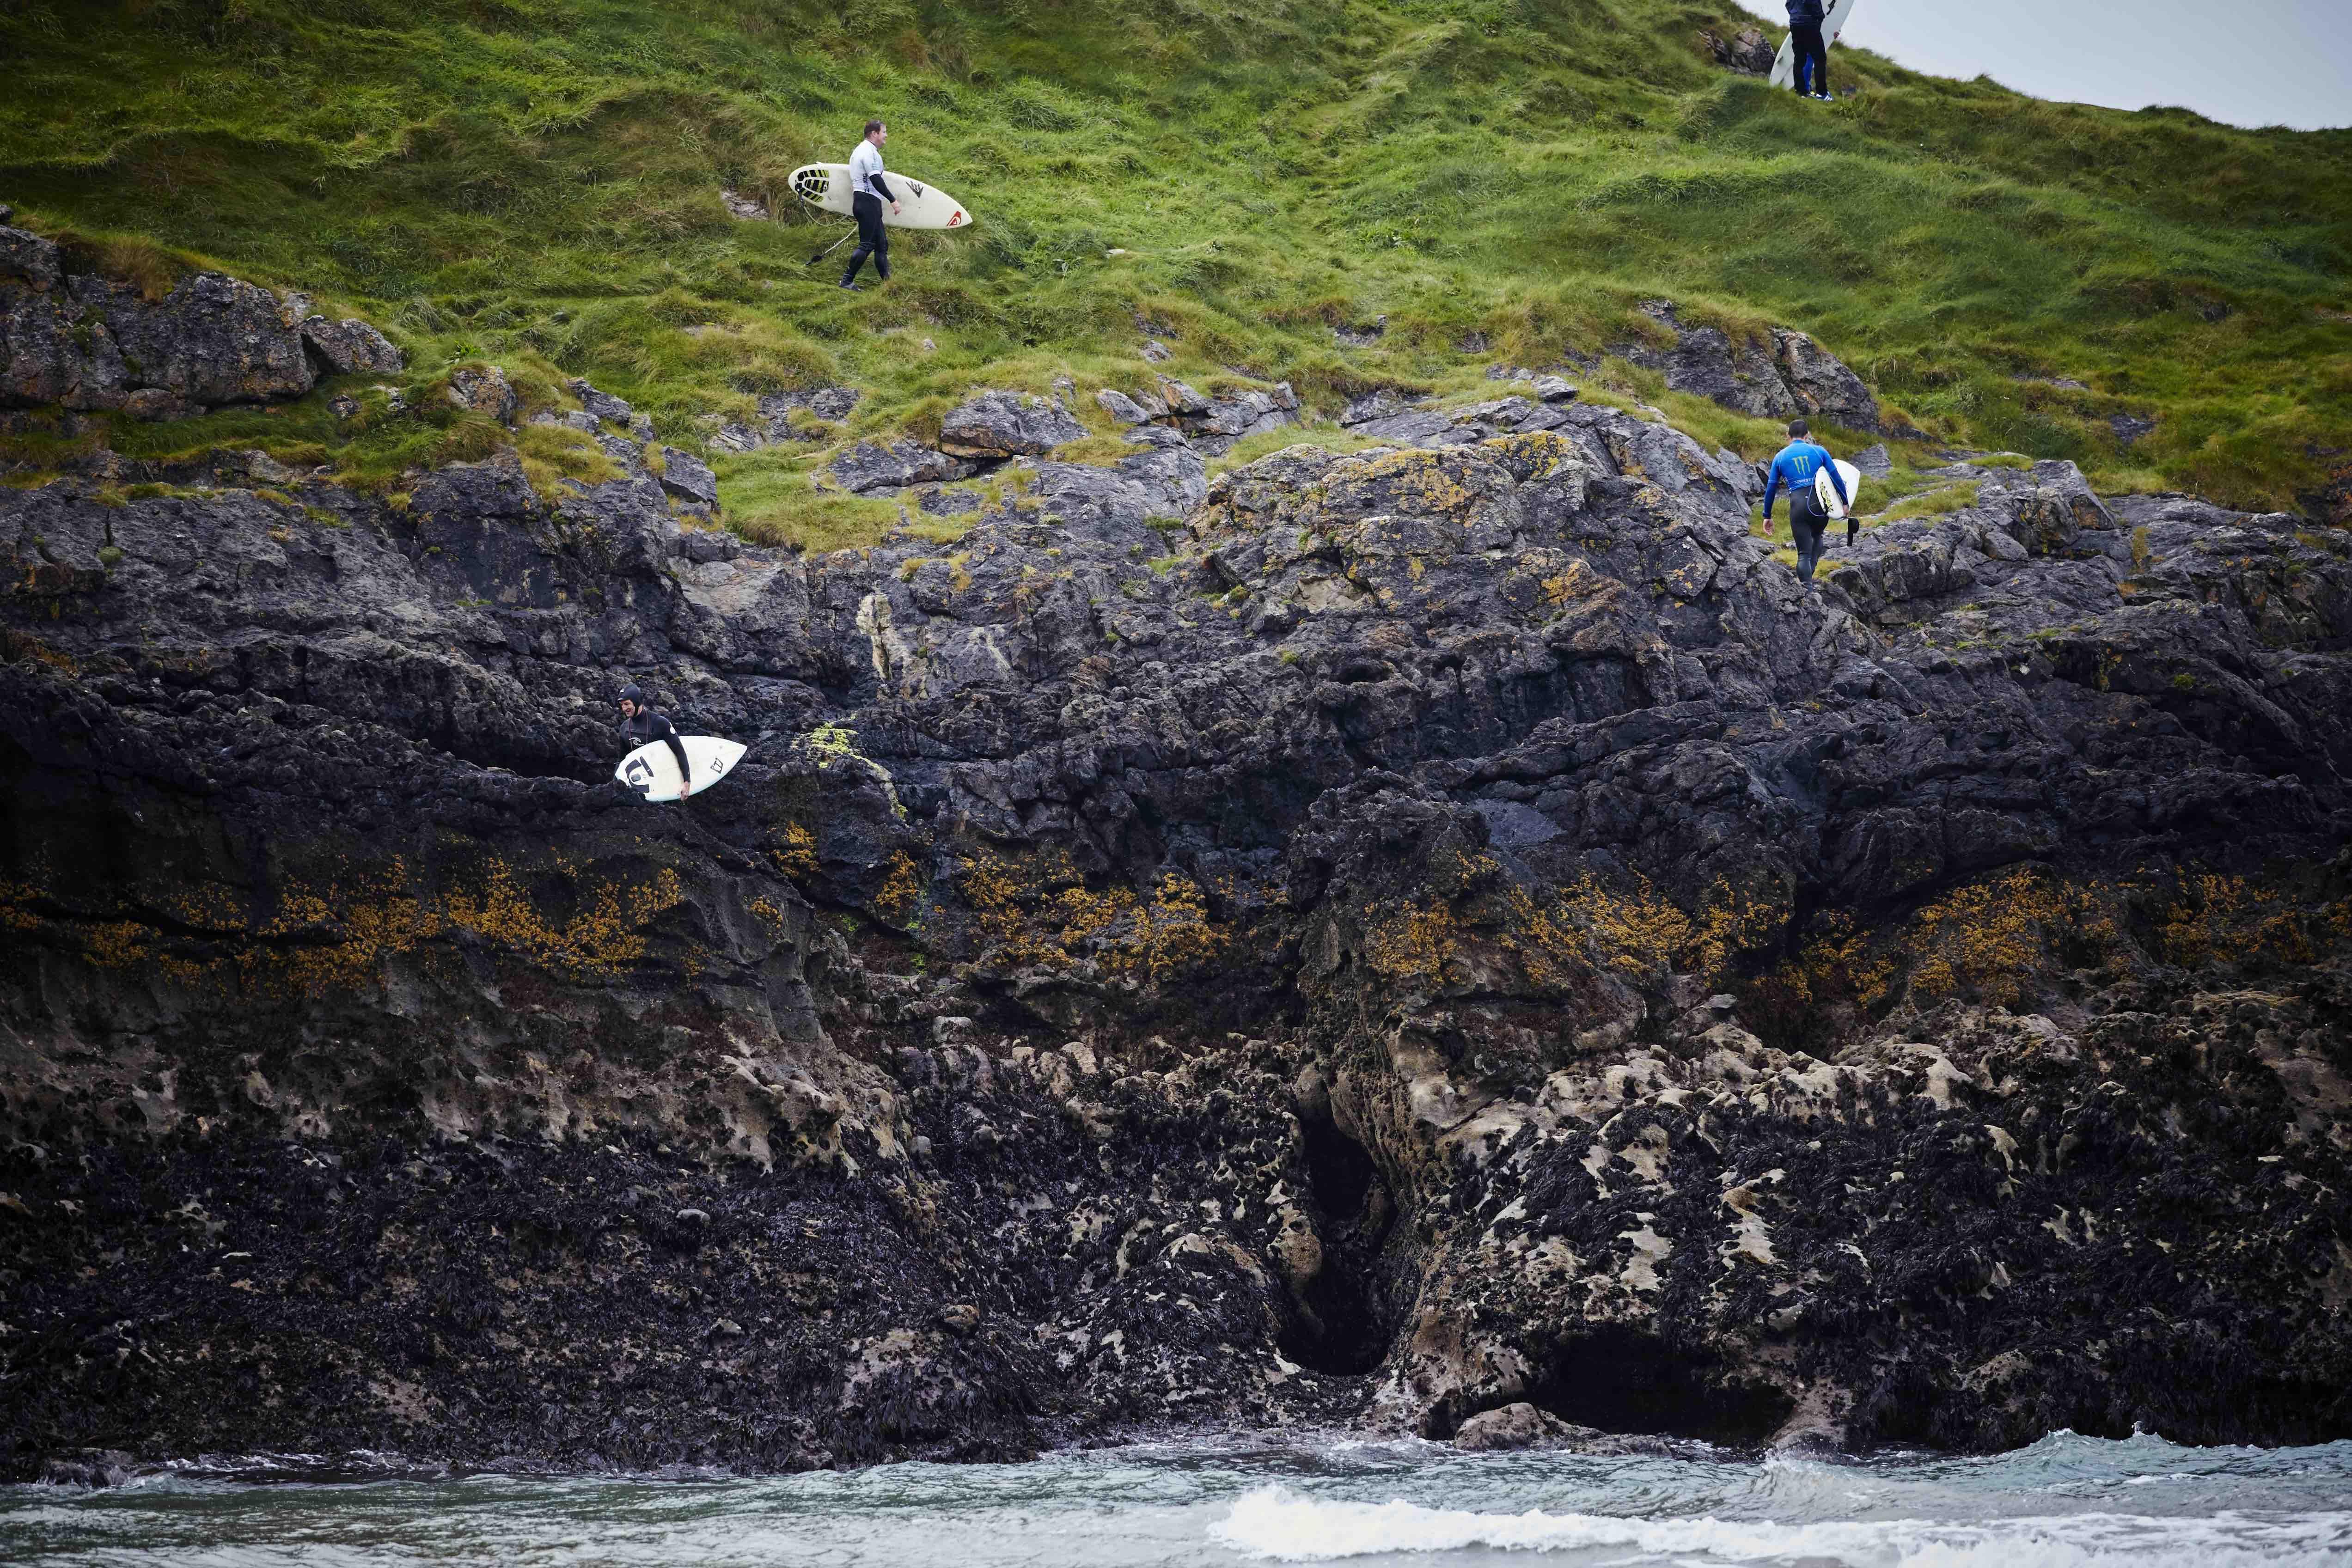 Irish_Surfing_1107